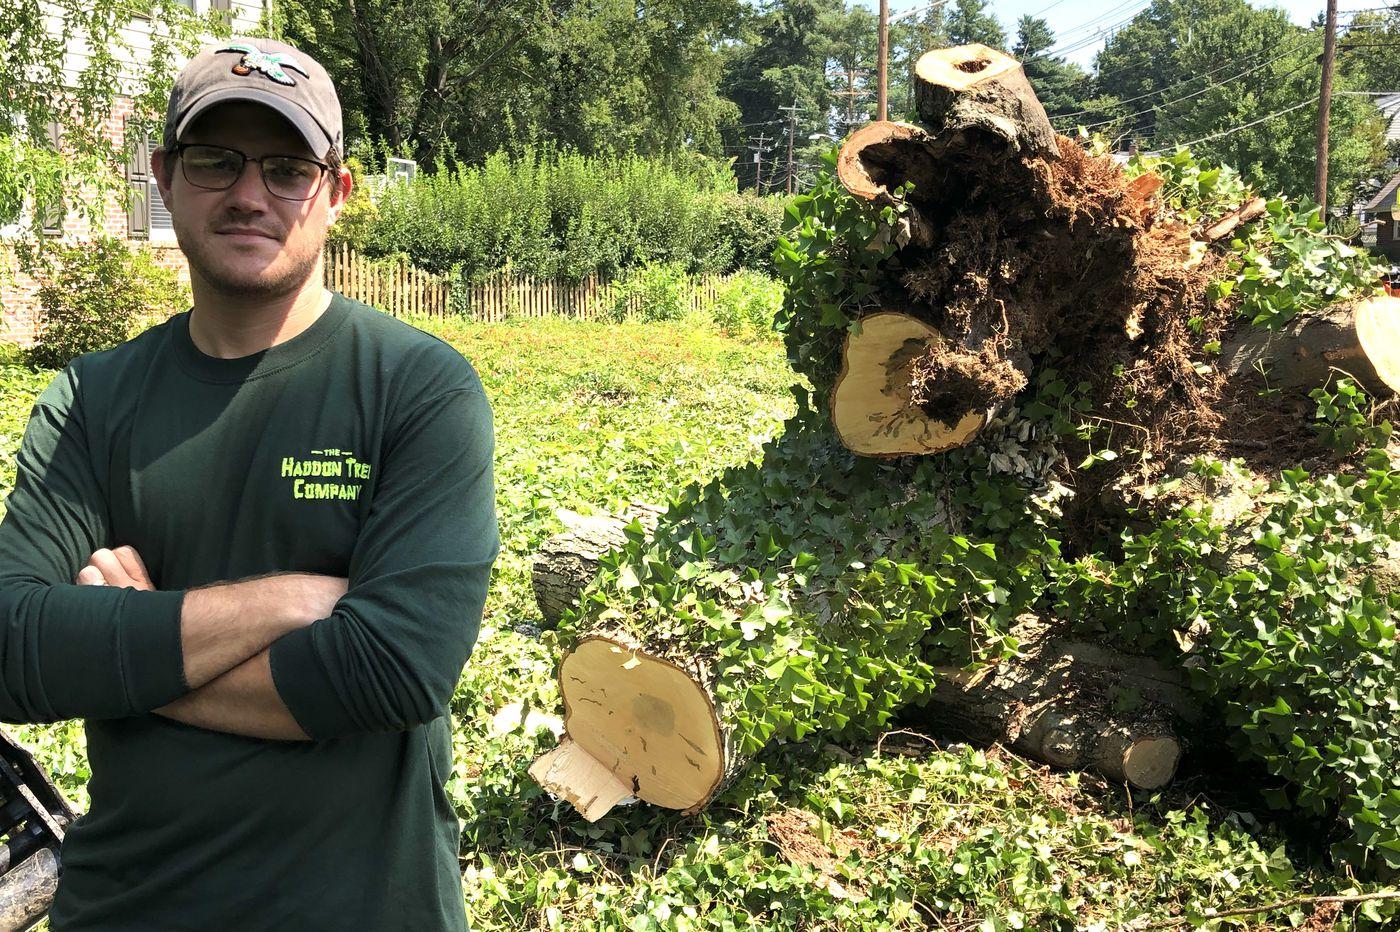 This has been a tough season so far for trees | Kevin Riordan